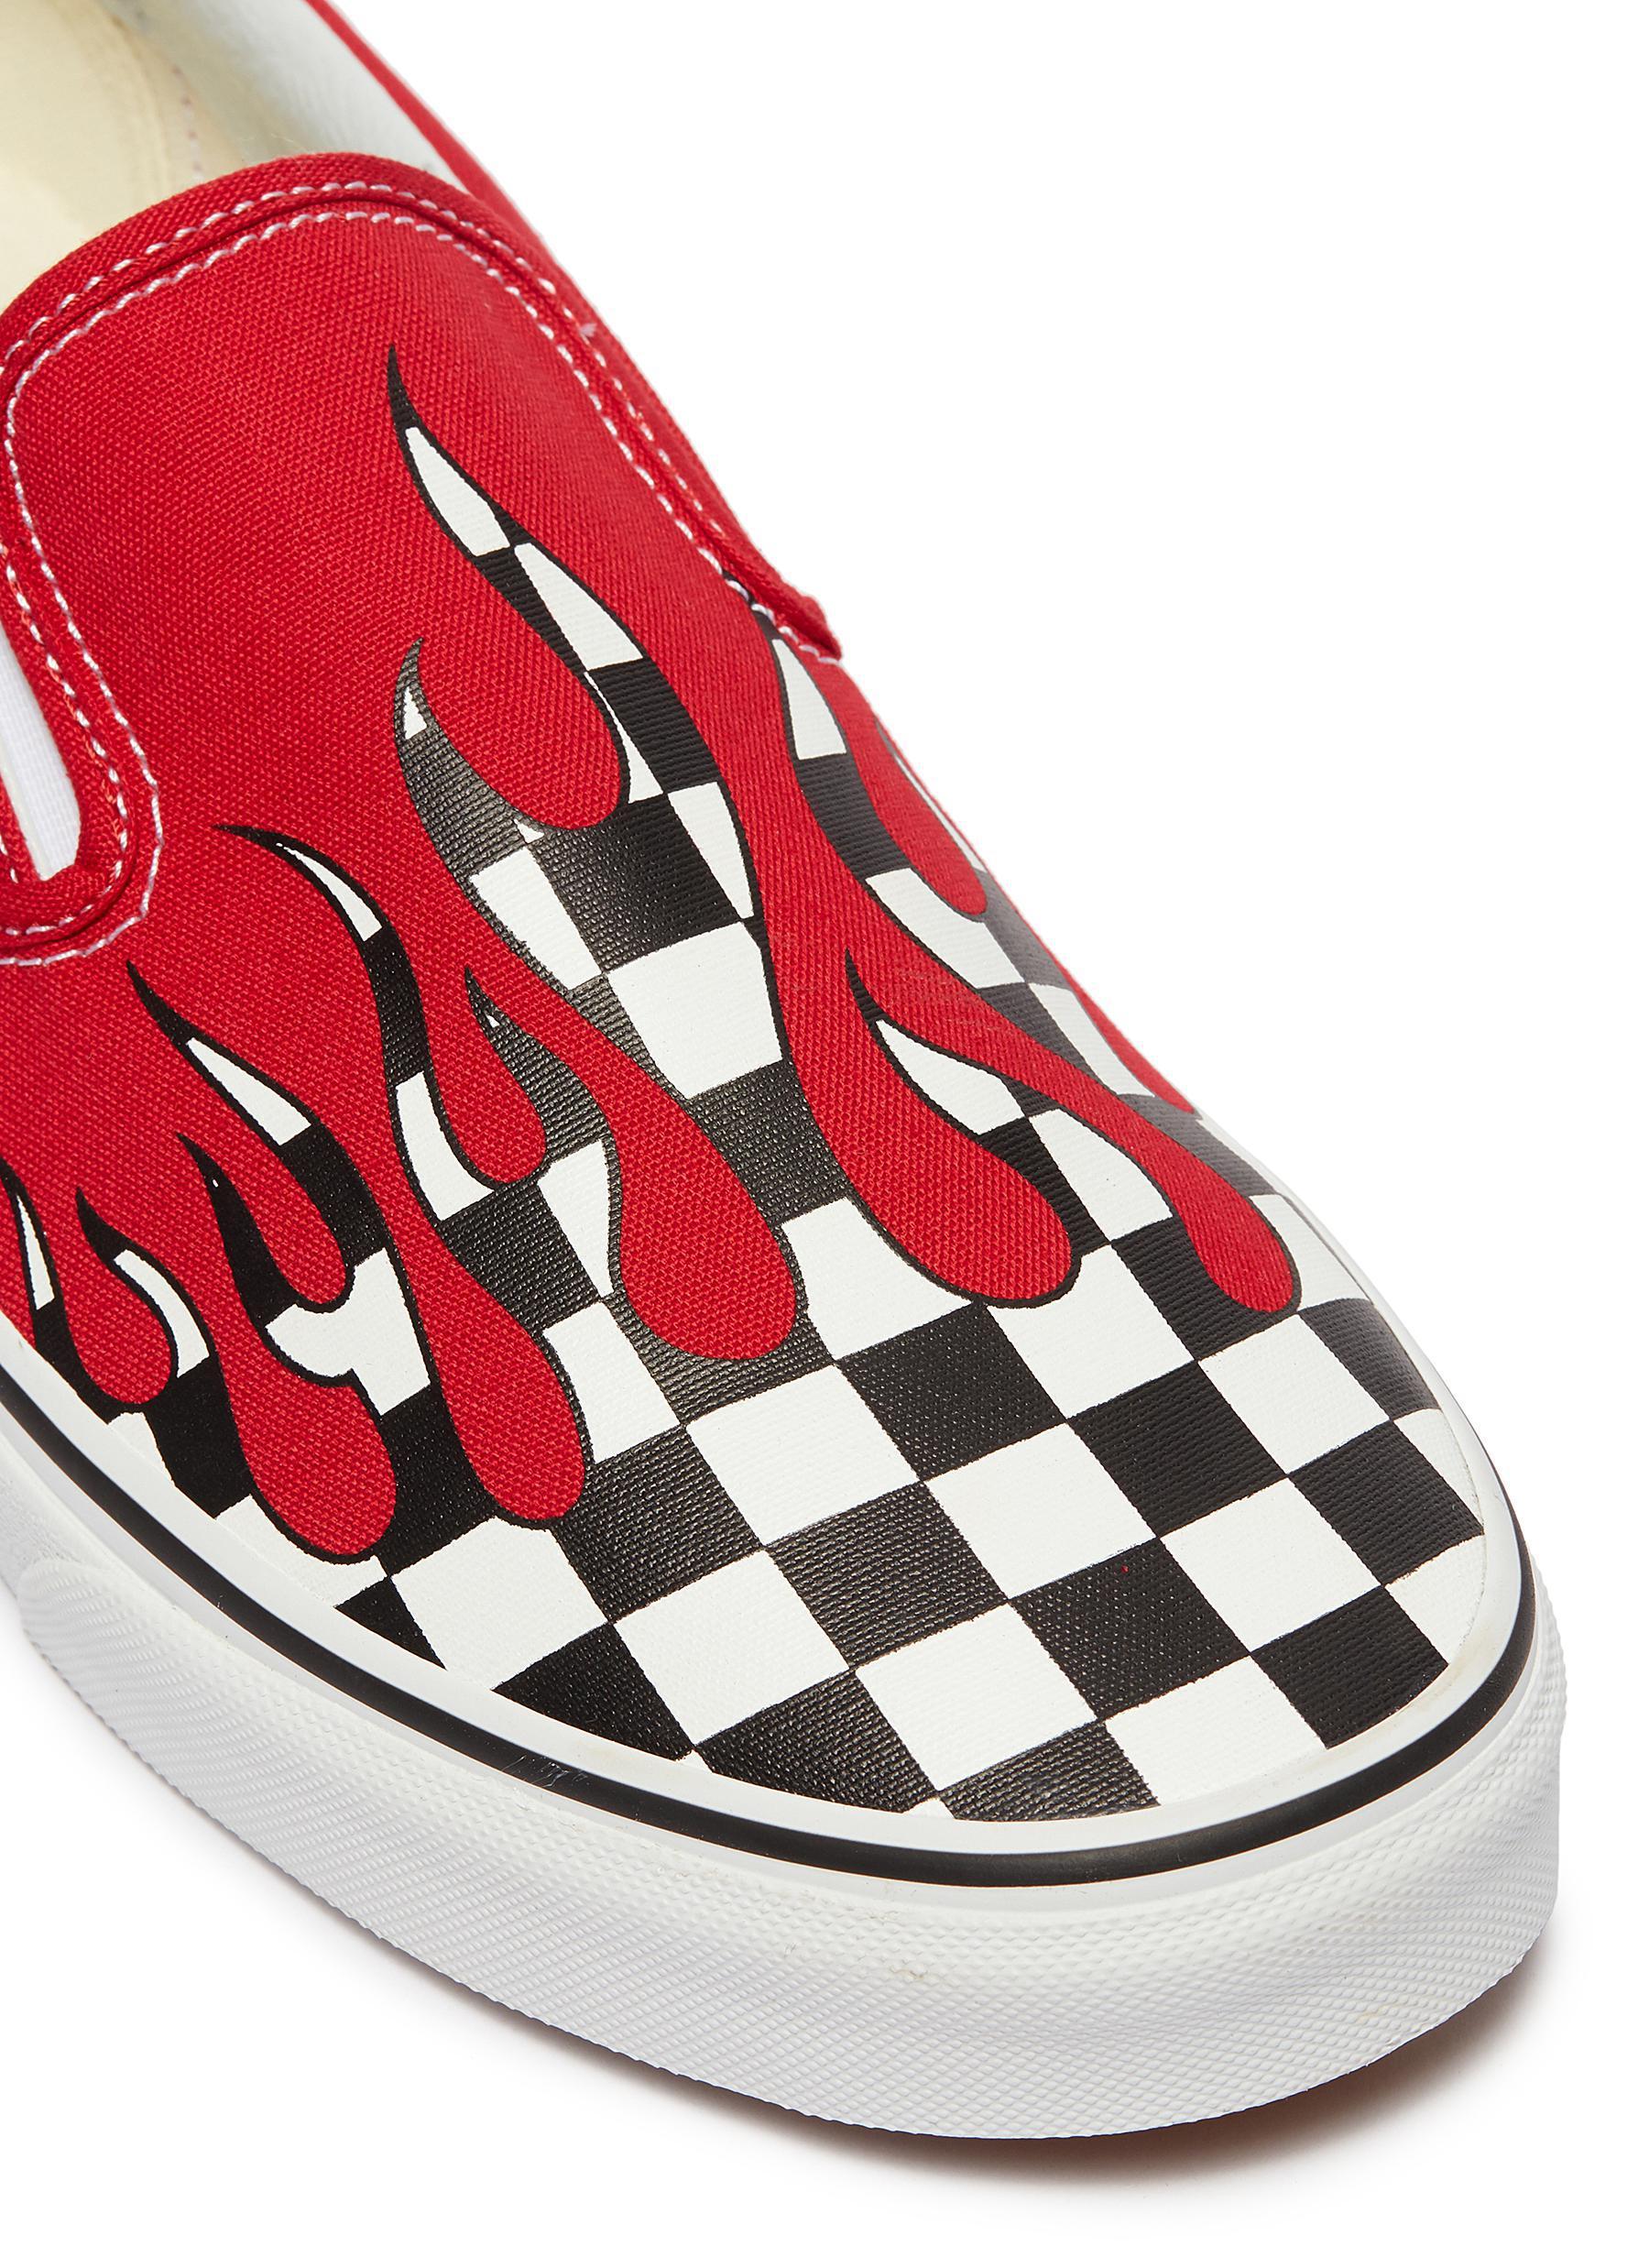 Vans 'classic Slip-on' Checkerboard